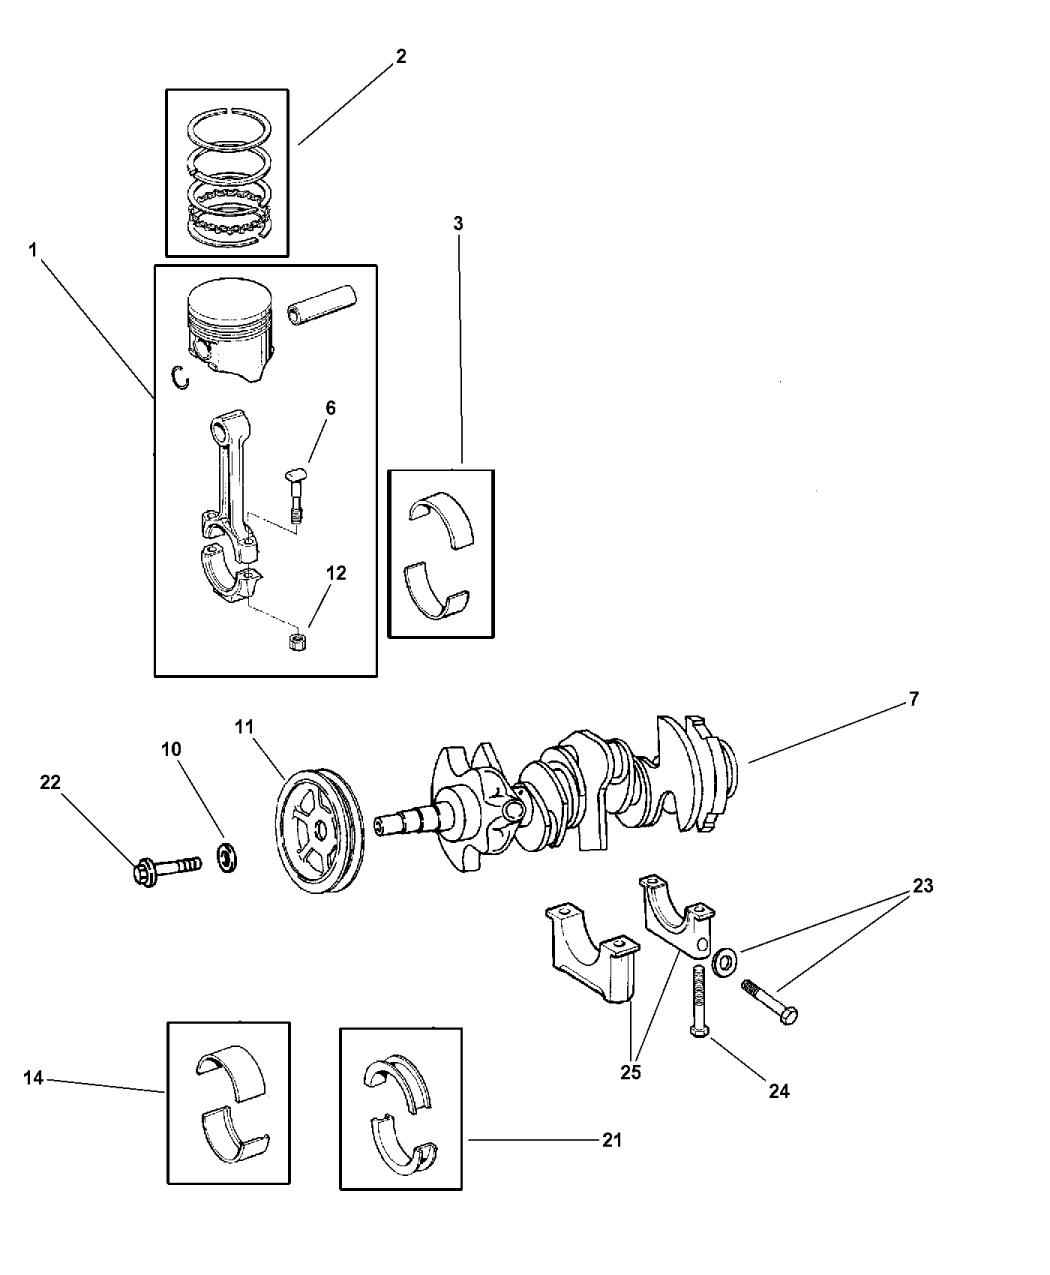 2002 Chrysler Prowler Crankshaft Piston Mopar Parts Giant Plymouth Wiring Diagrams